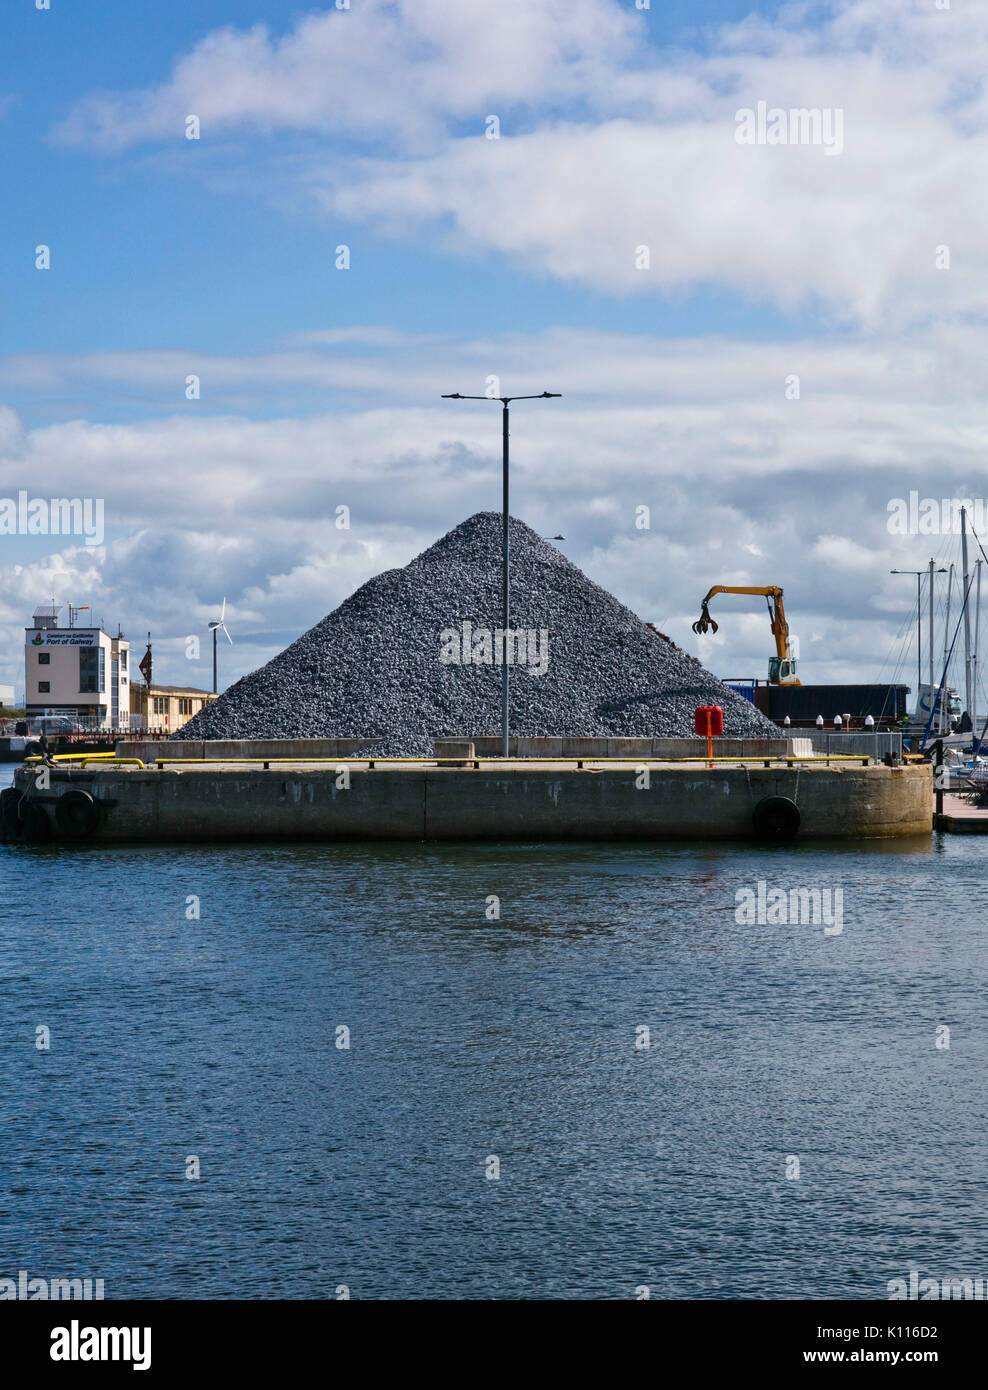 Pile Of Stones - Stock Image